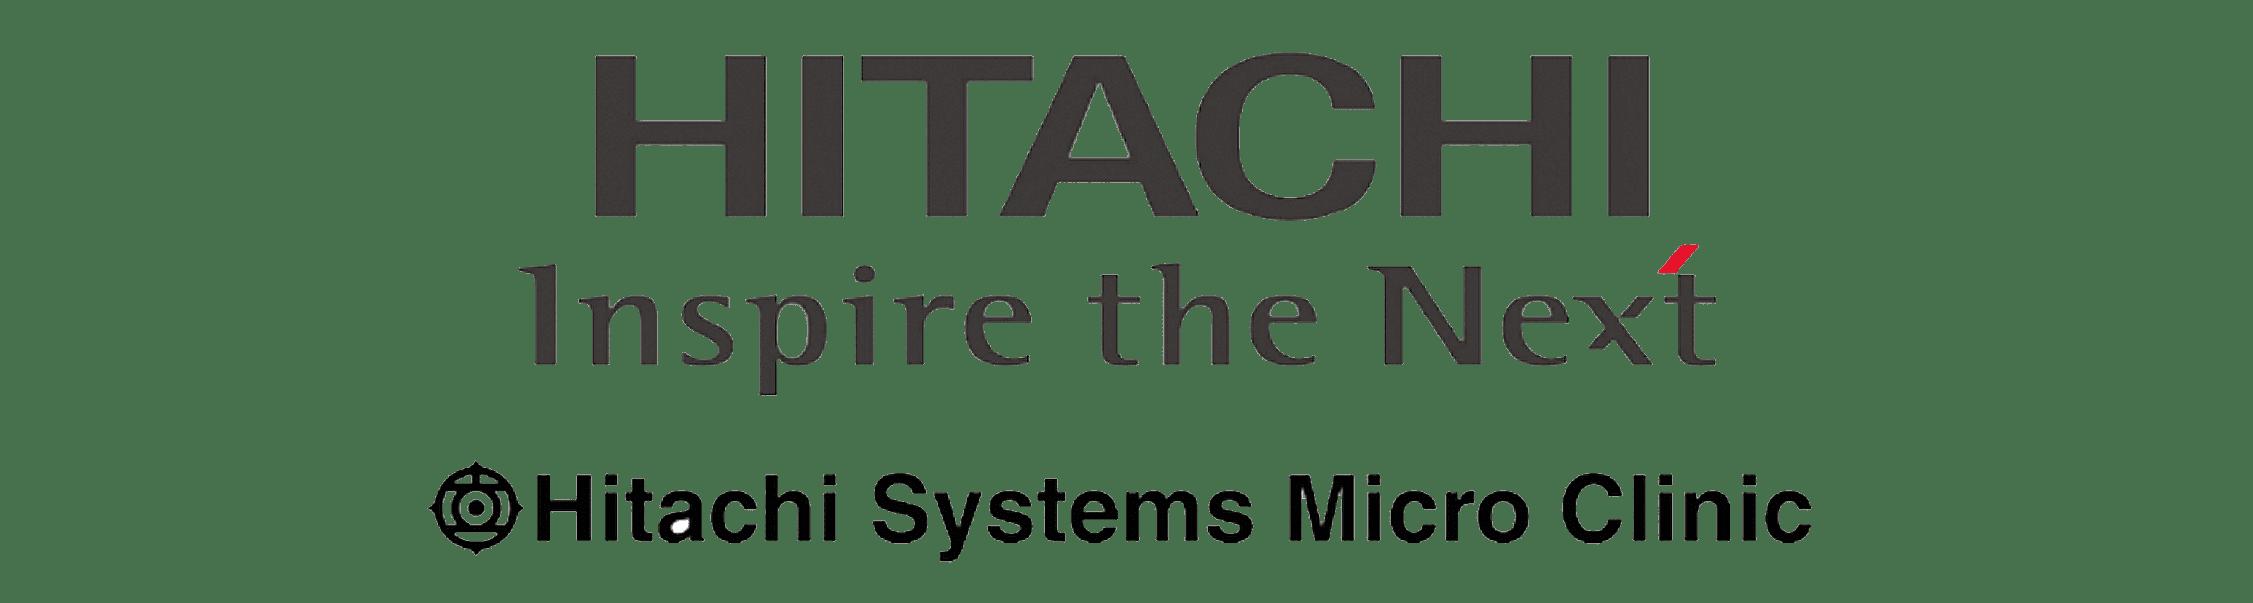 CV parsing solution for Hitachi